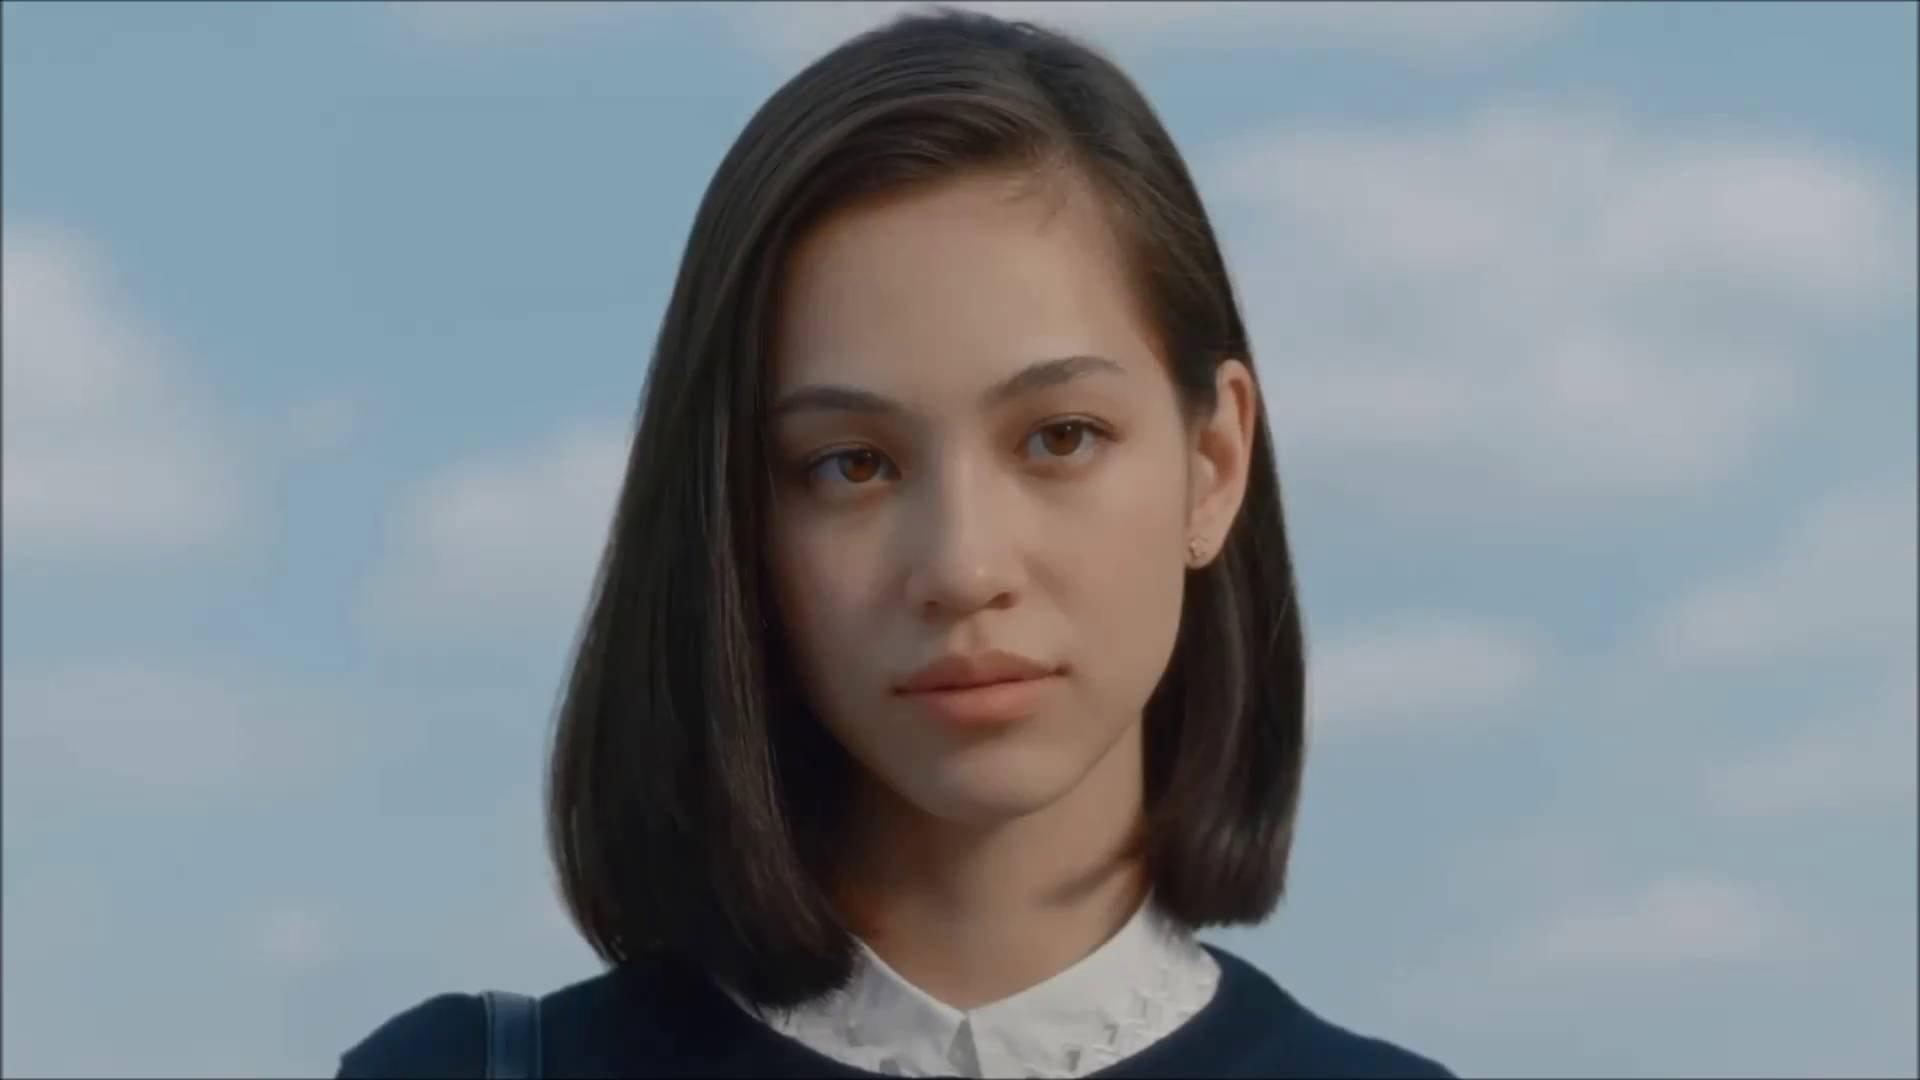 img 5a6f12abf3026.png?resize=412,232 - 女子が憧れる髪型NO.1!水原希子のワンレンボブが似合う顔の系統は?